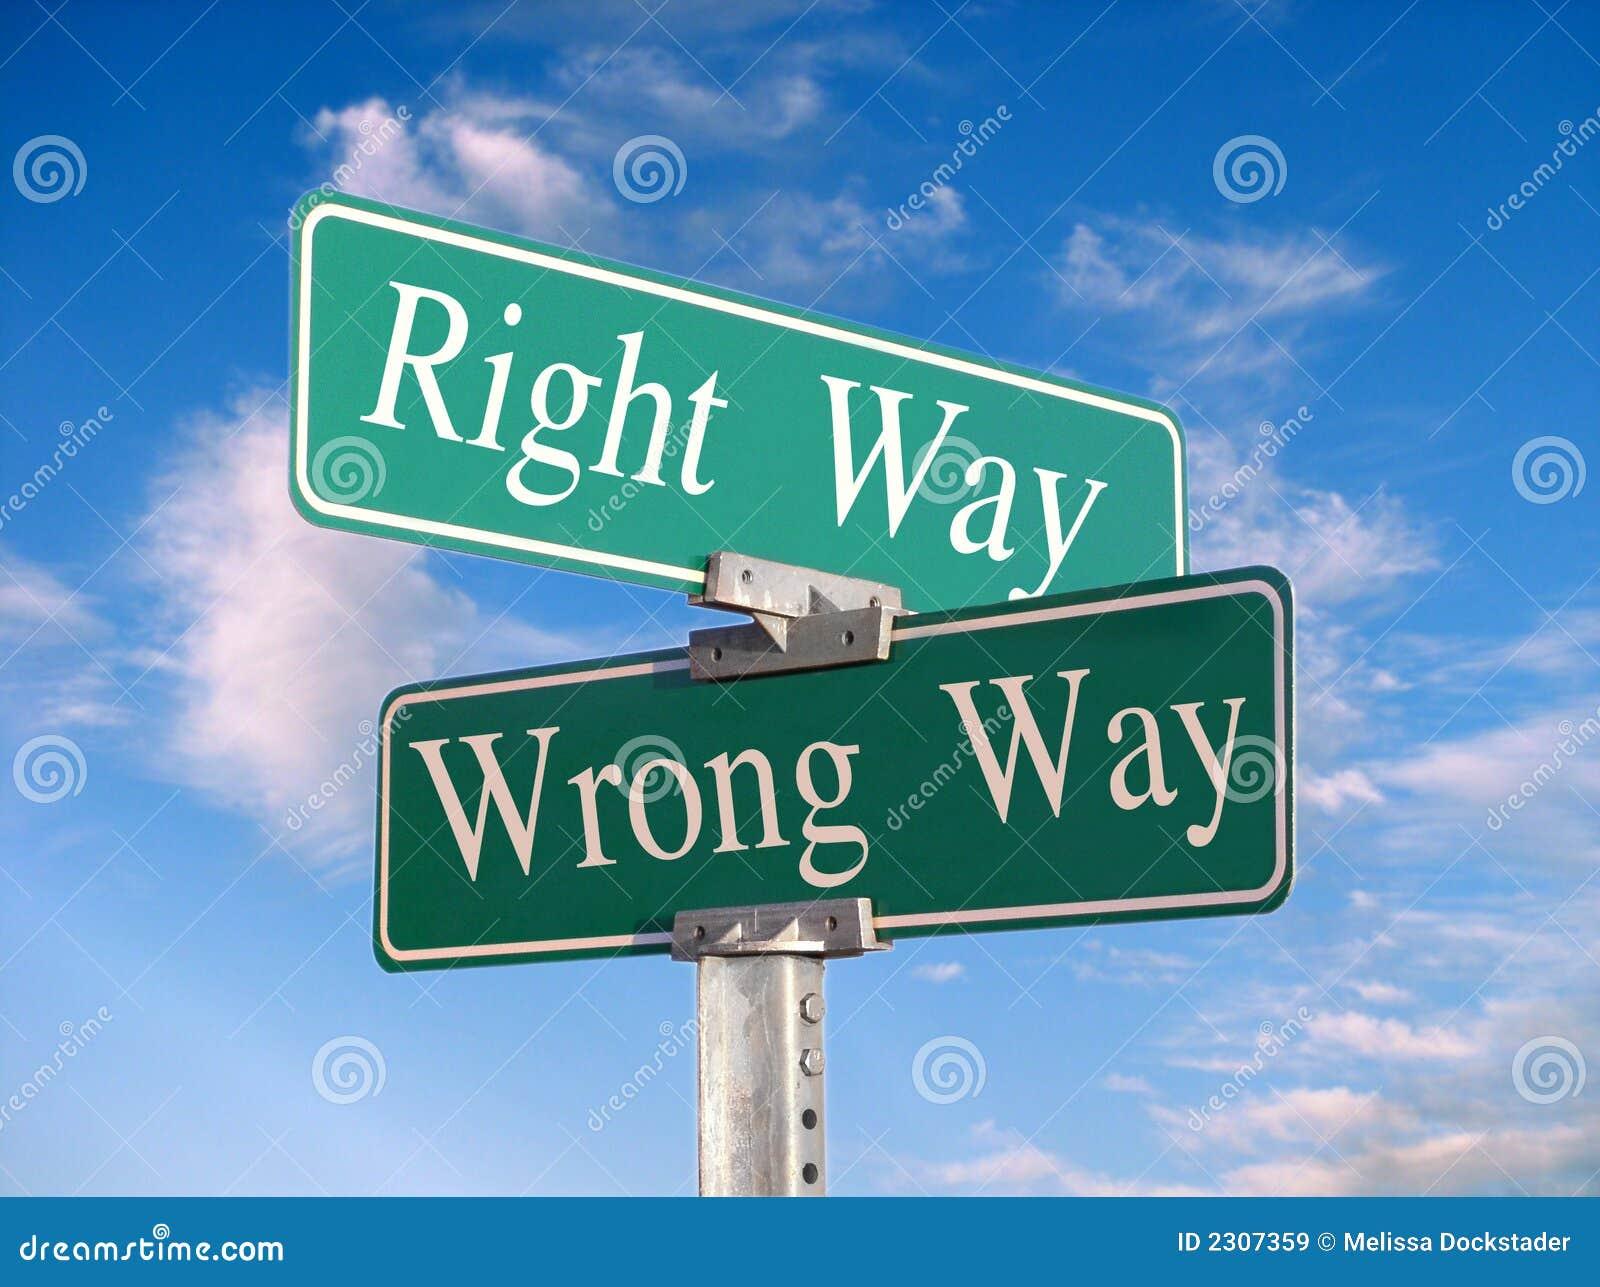 Il giusto modo o modo errato